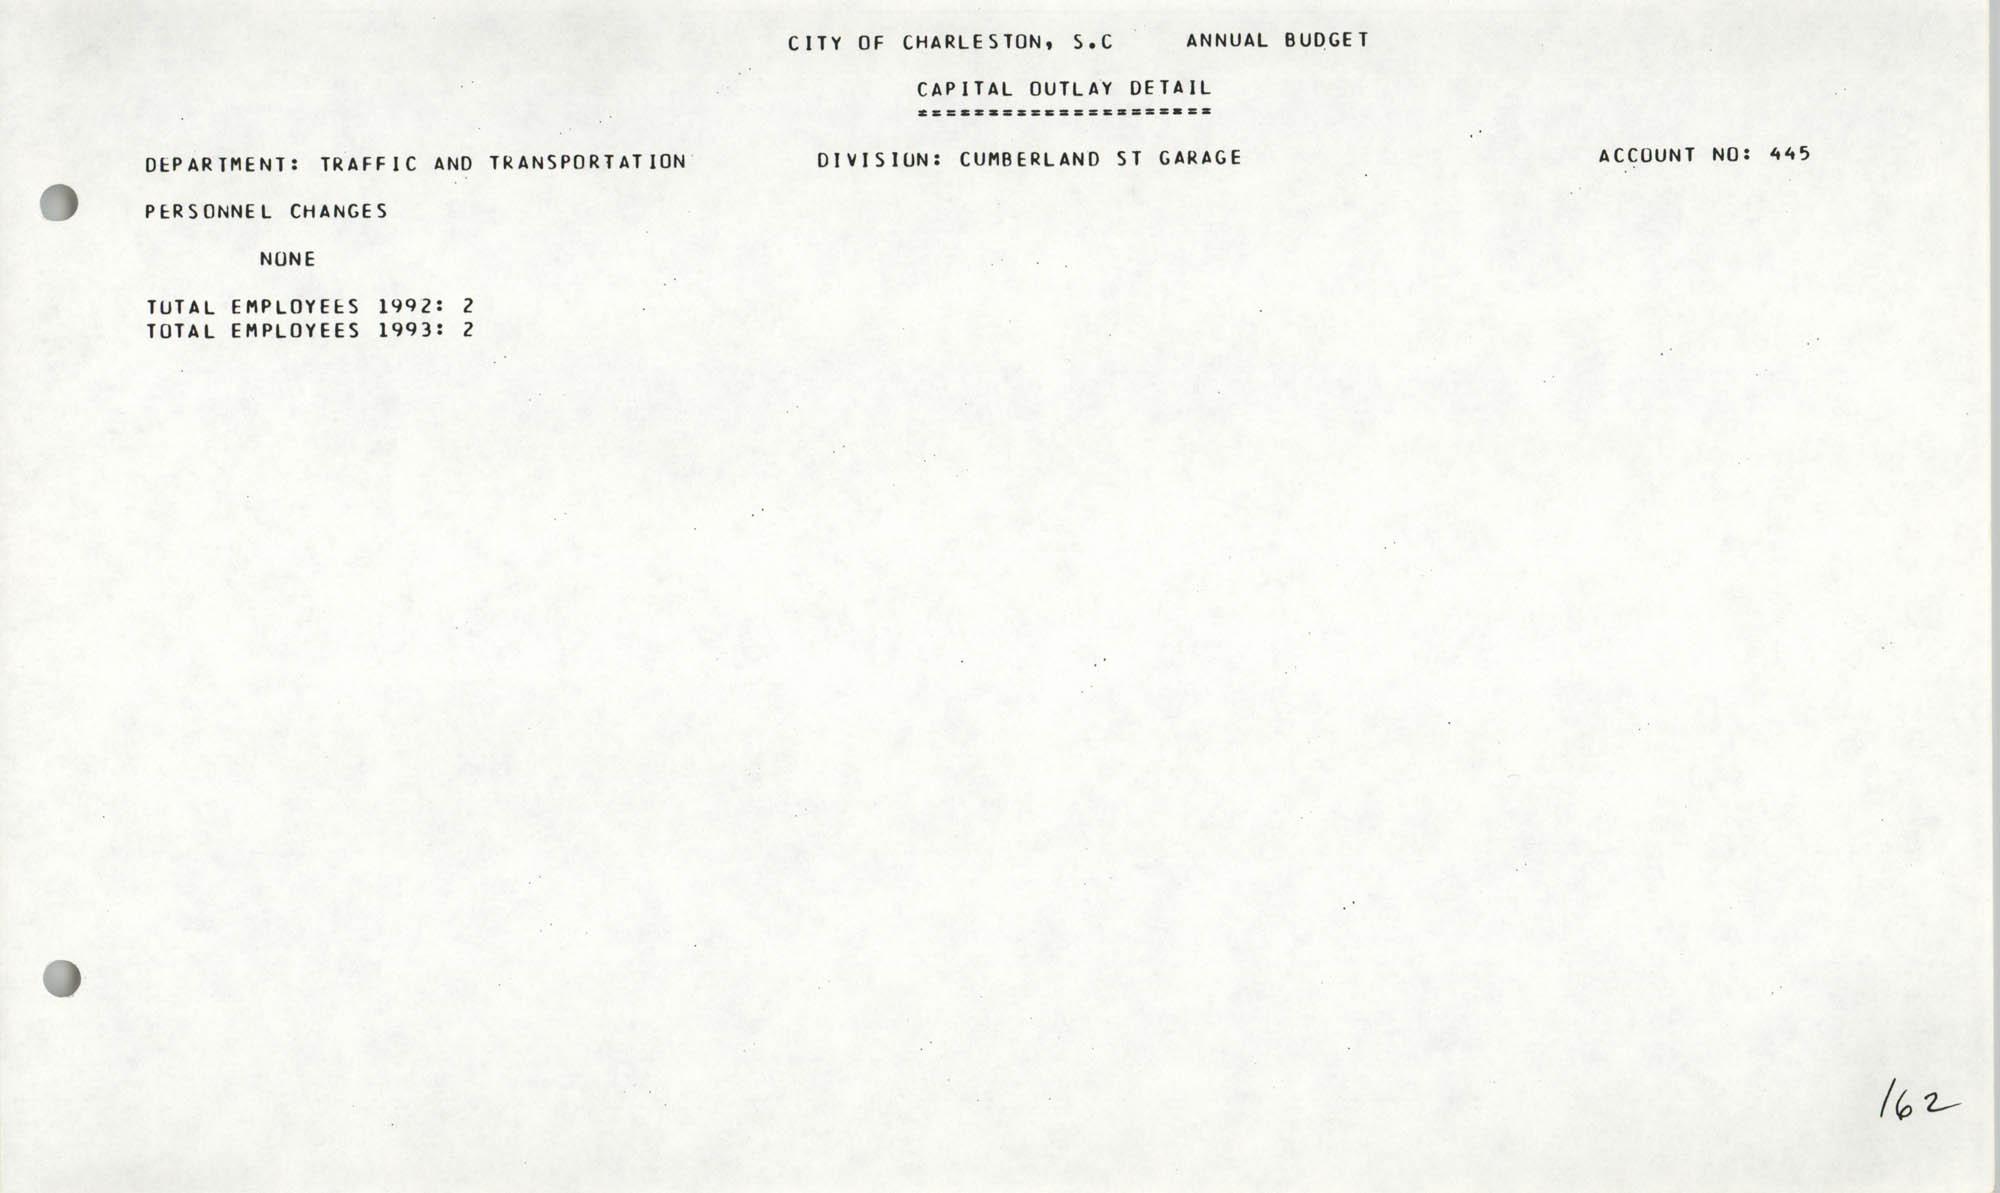 The City Council of Charleston, South Carolina, 1993 Budget, Page 162